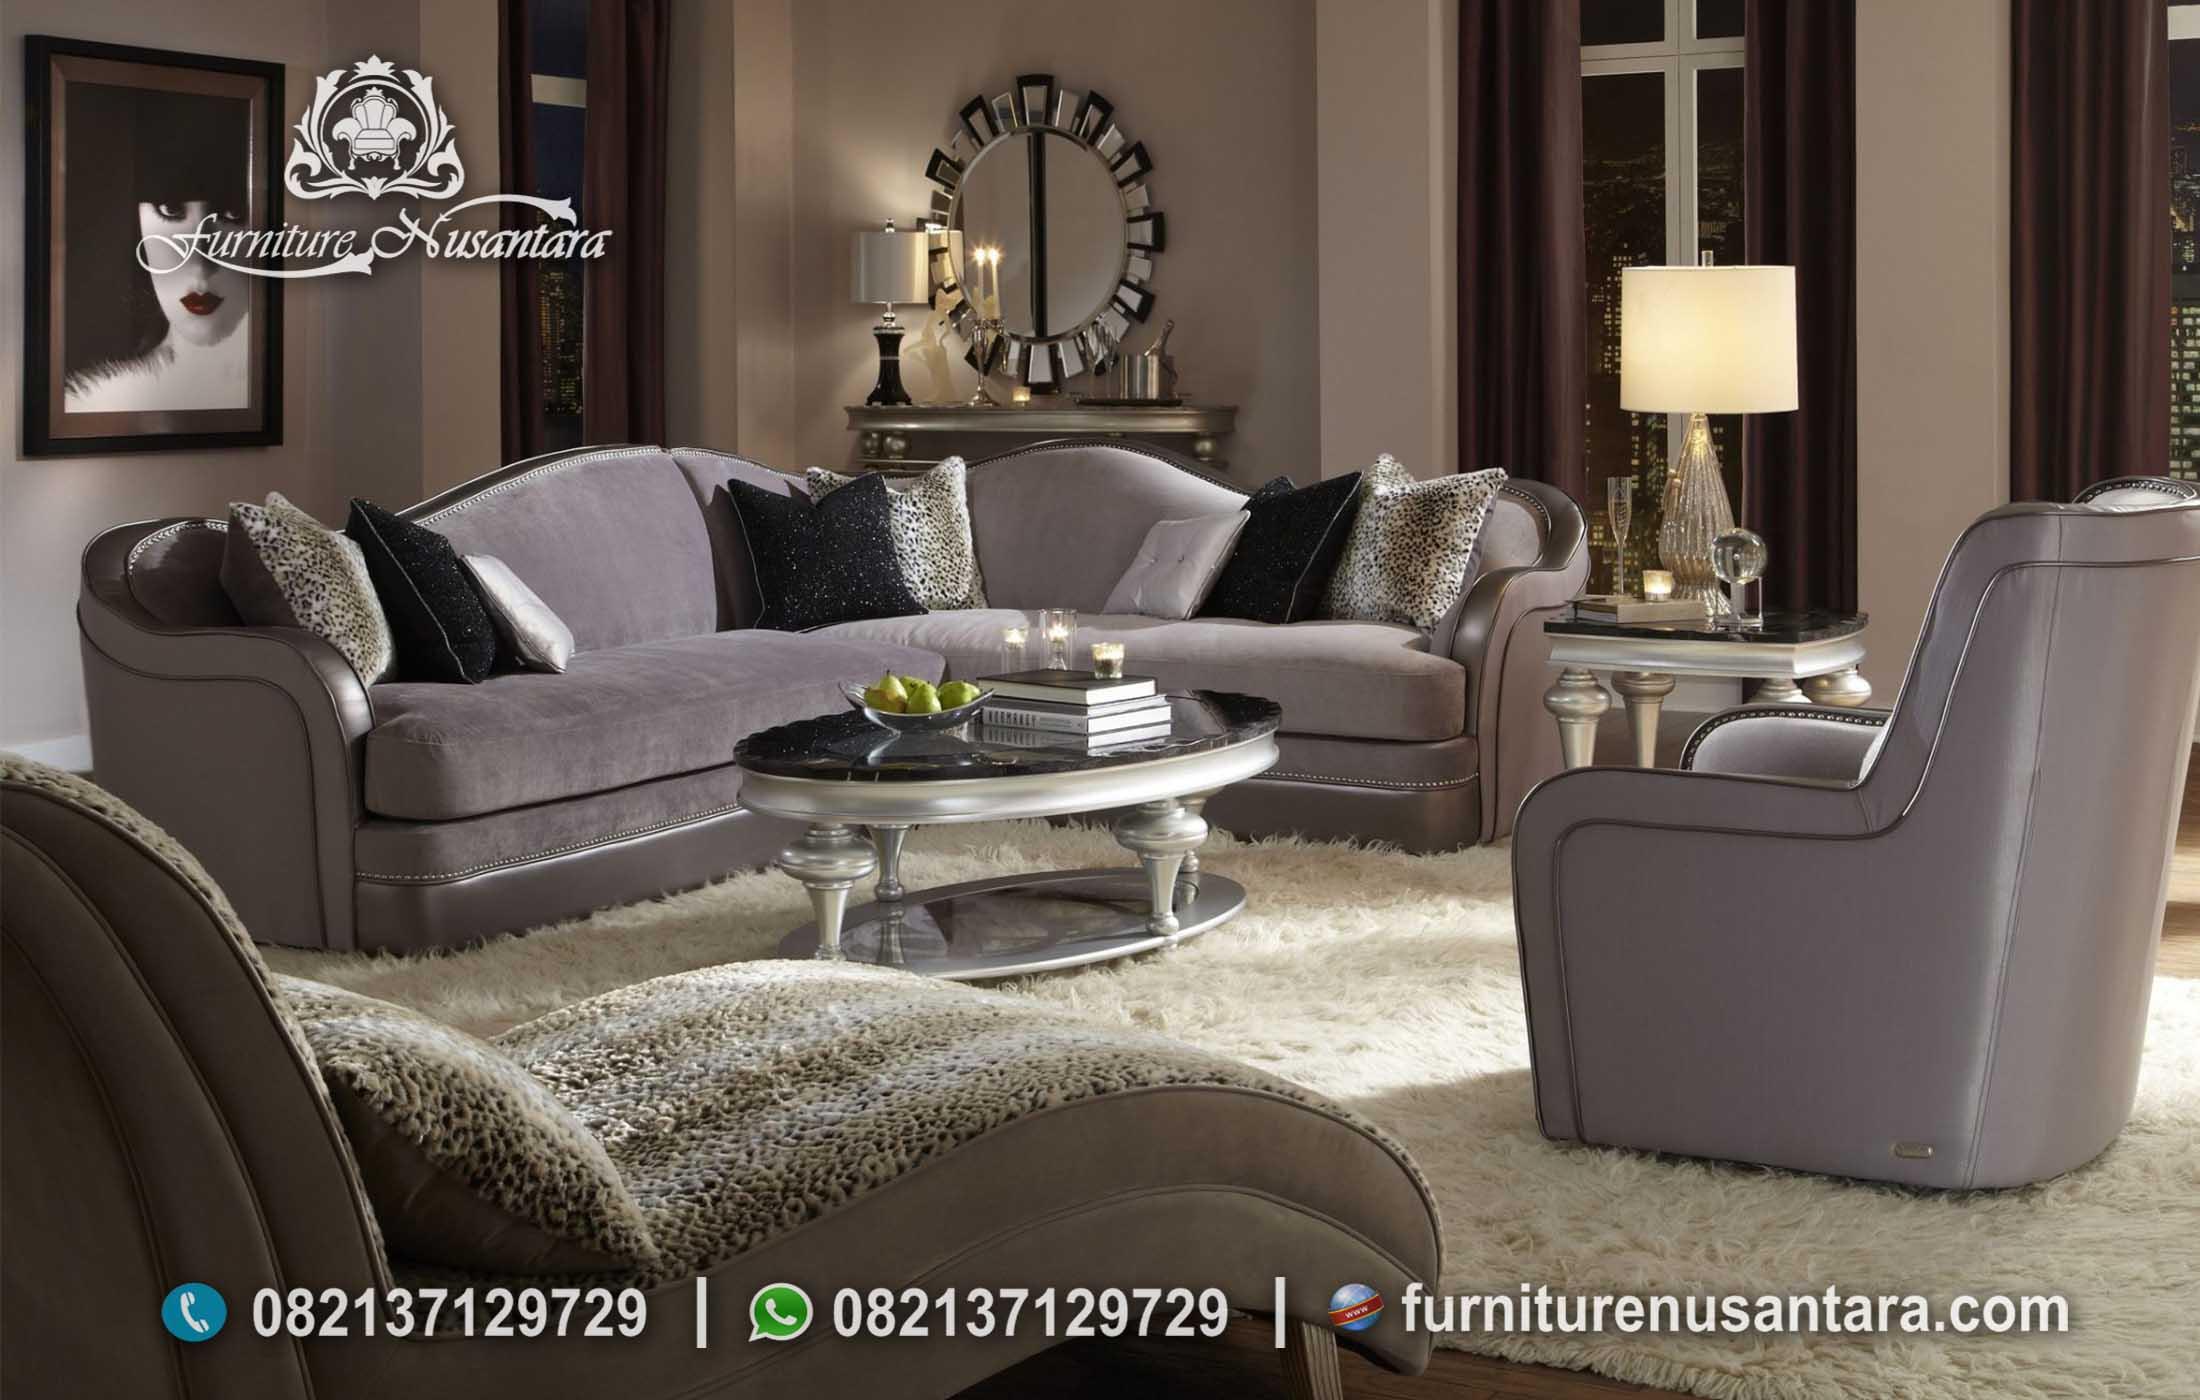 Sofa Sudut Model Eropa Minimalis ST-87, Furniture Nusantara